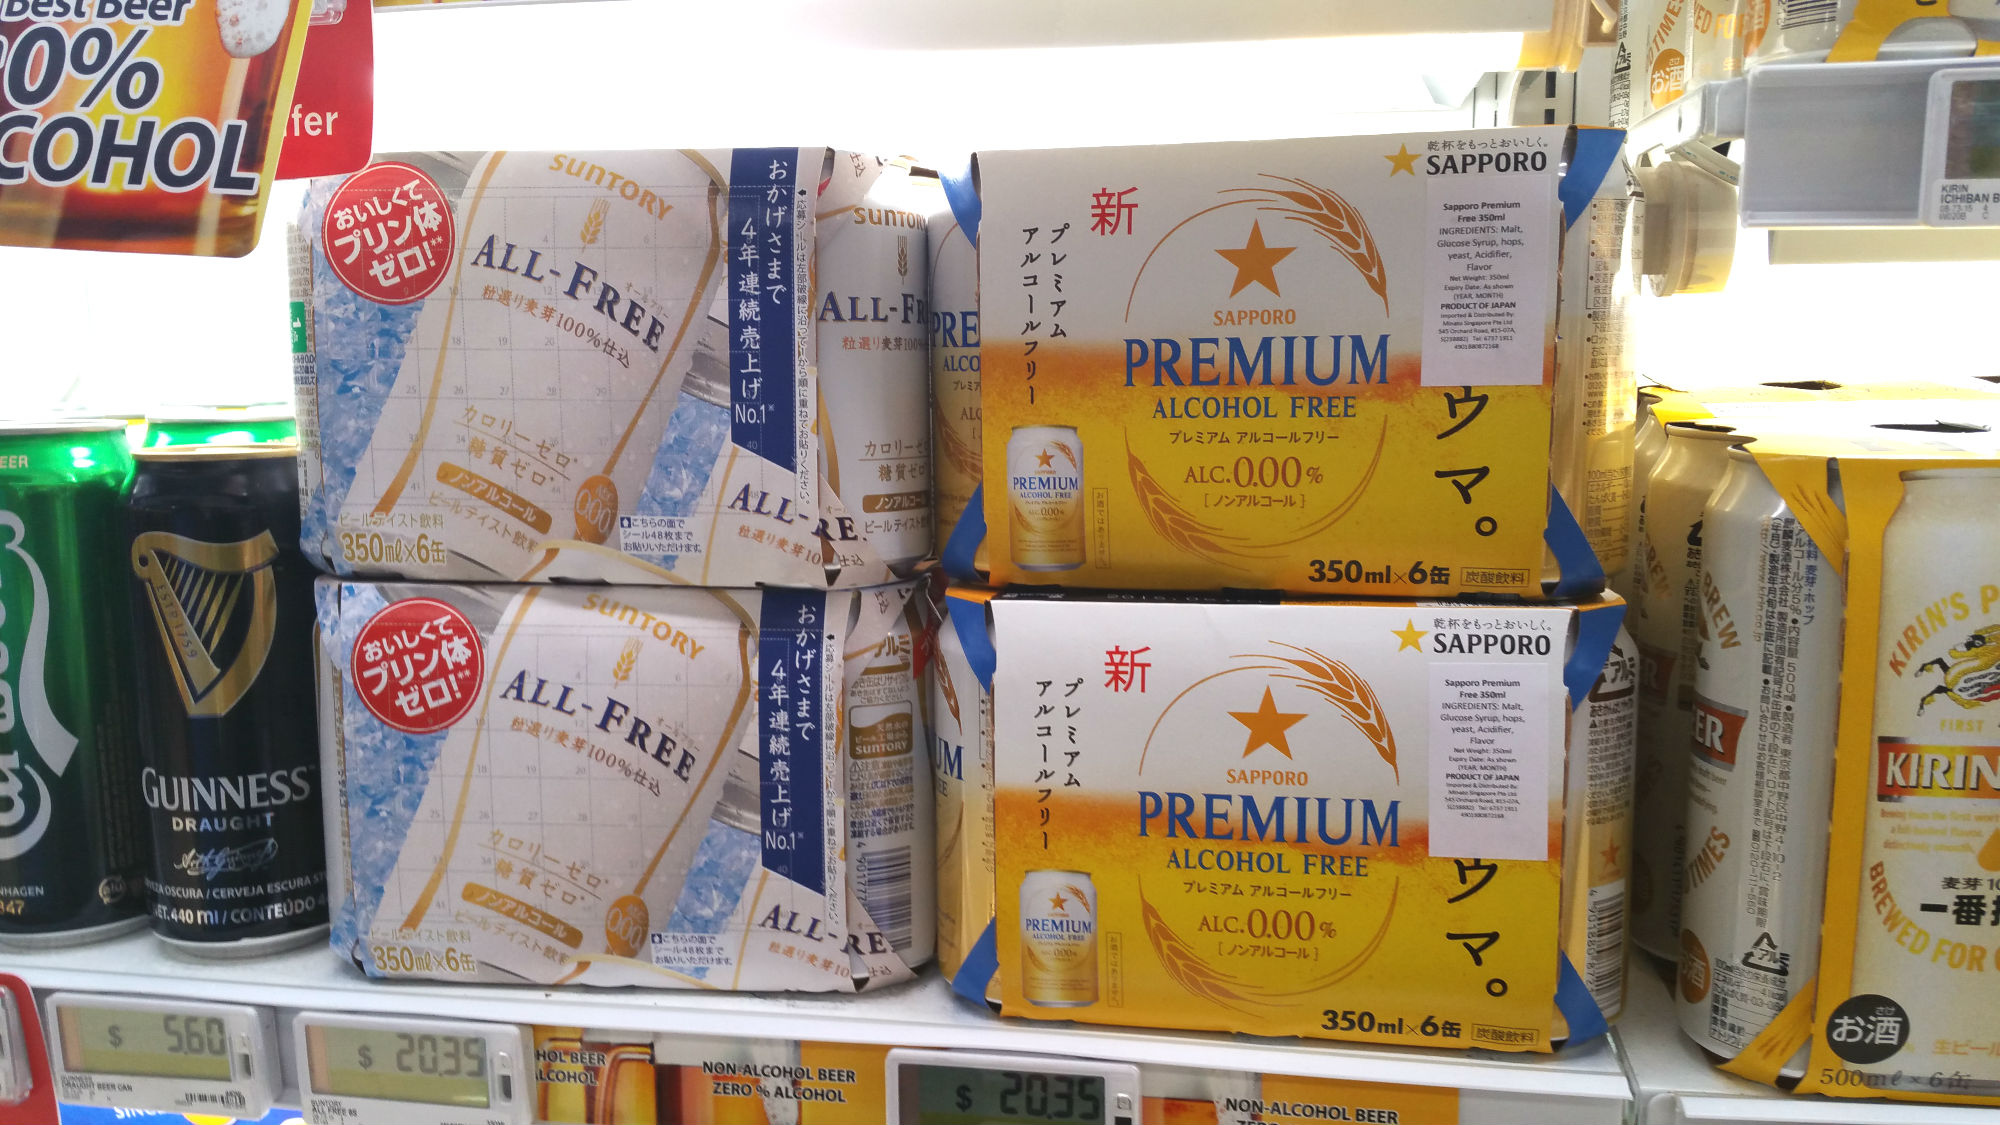 Halal beer Singapore